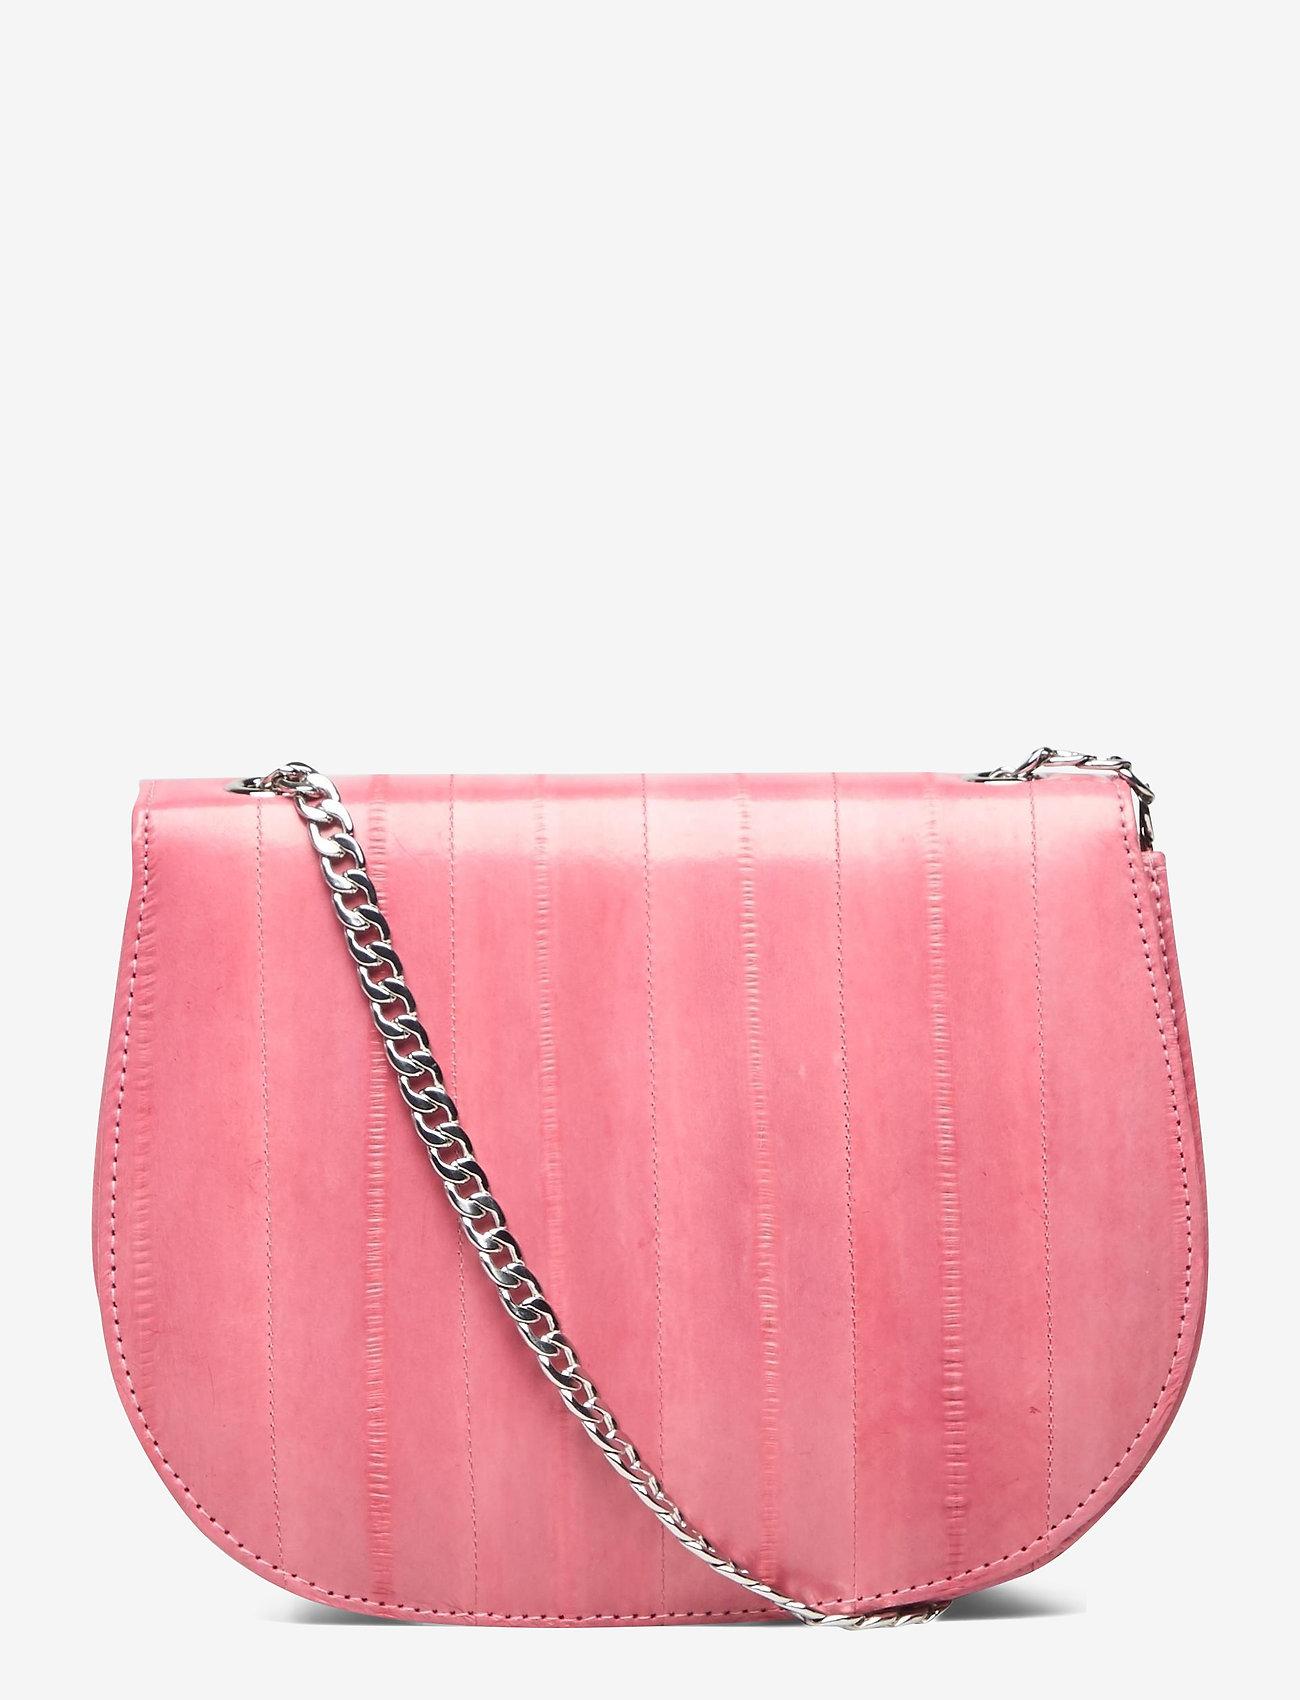 Becksöndergaard - Linda bag - torby na ramię - peach pink - 0